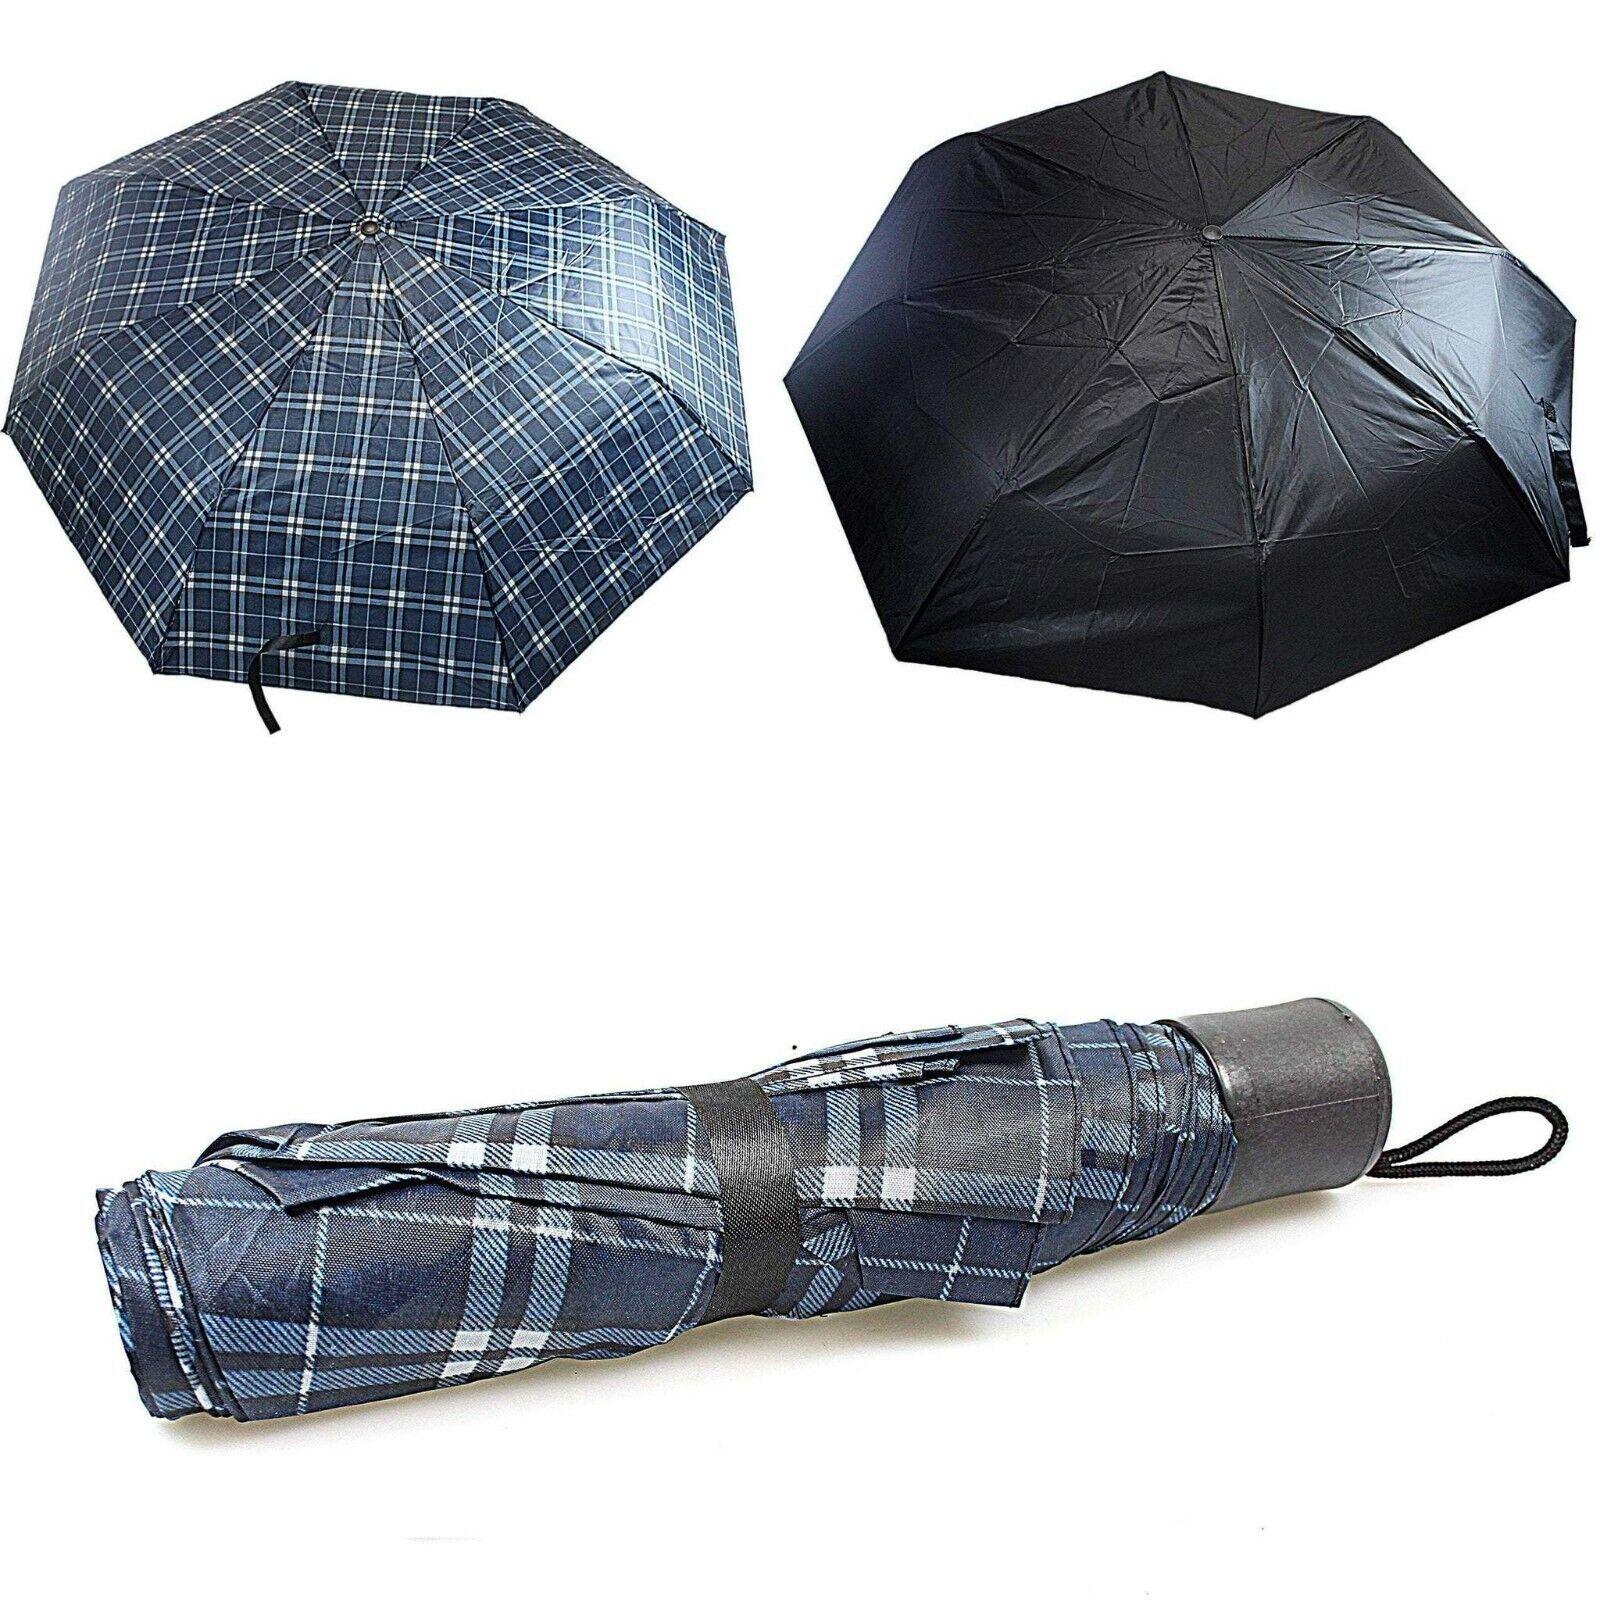 High quality Umbrella Universal Standard Handbag Size Brolly Rain Protection